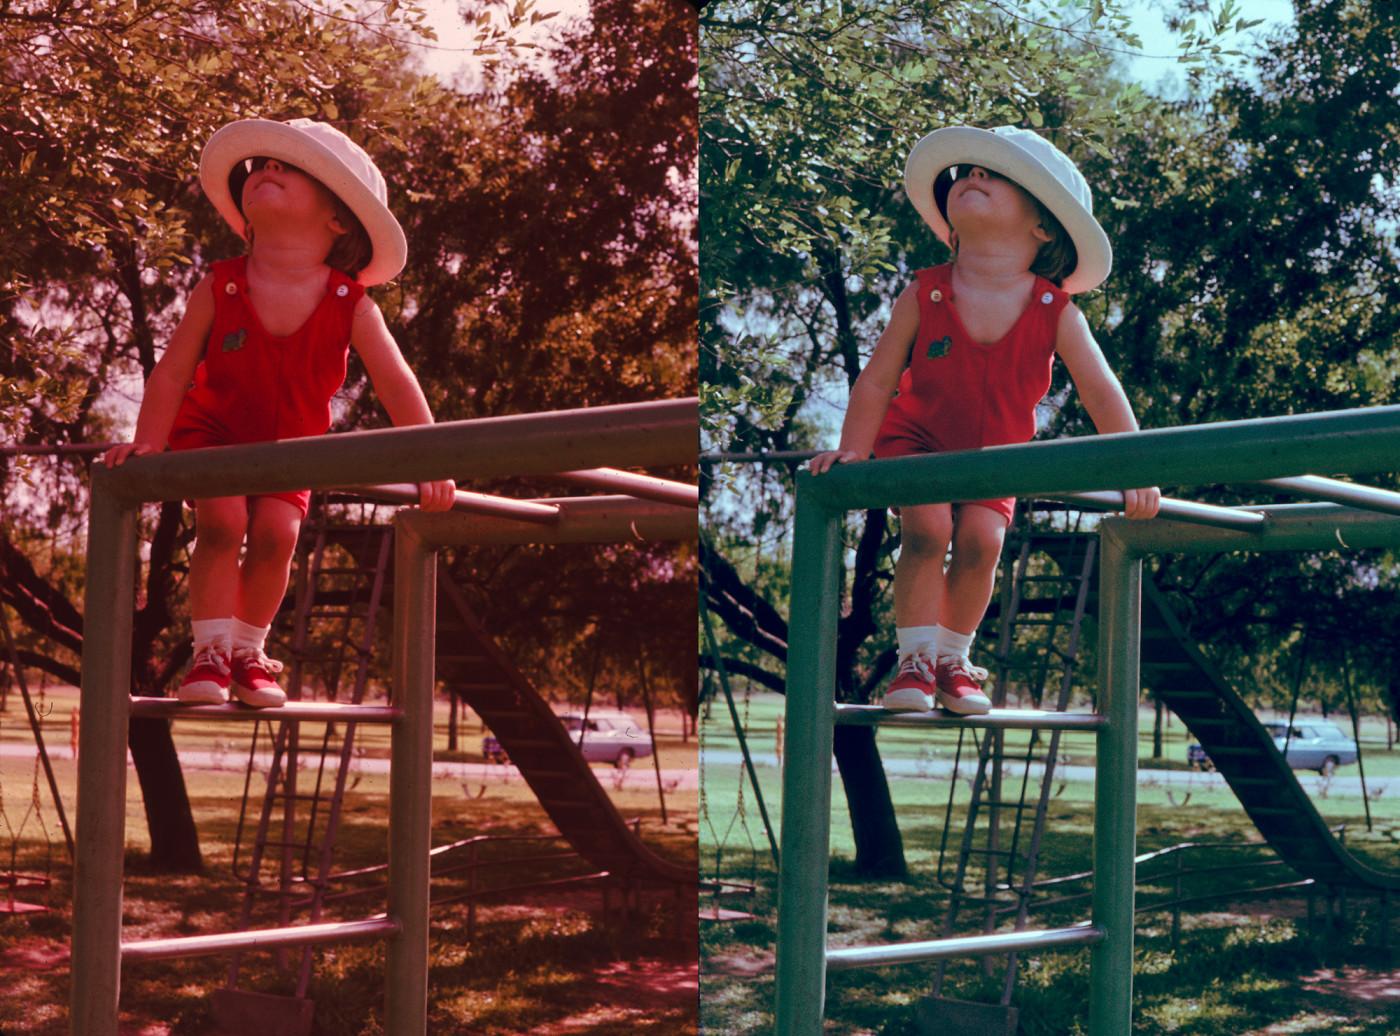 Figure 2. Ektachrome slide, without restoration (left) and restored (right), Corpus Christi TX, August 1975  [Ektachrome, 35mm. Joseph Goins; restoration Idlewild].